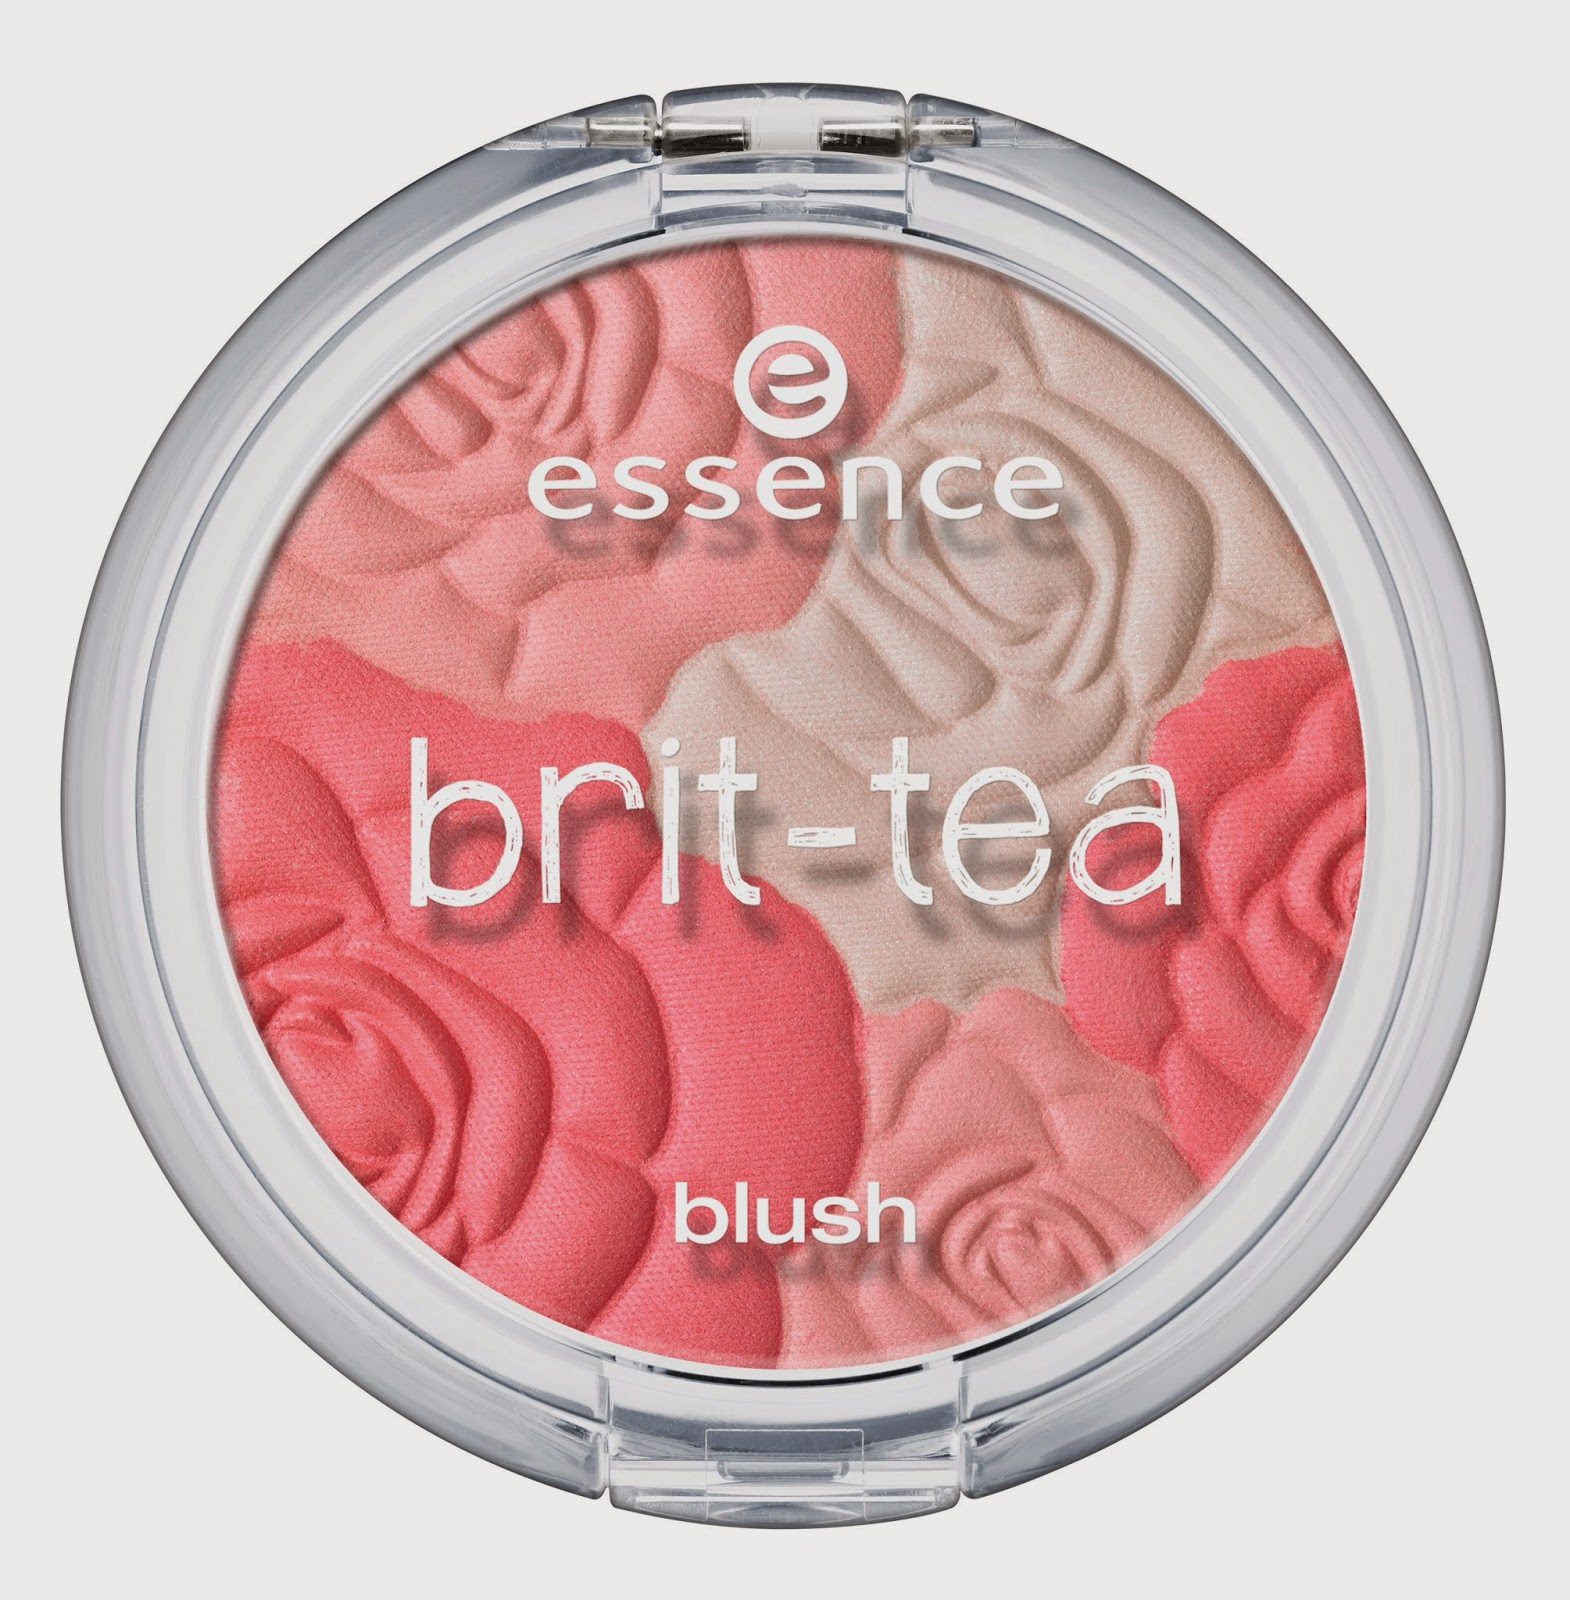 essence brit-tea – blush - www.annitschkasblog.de